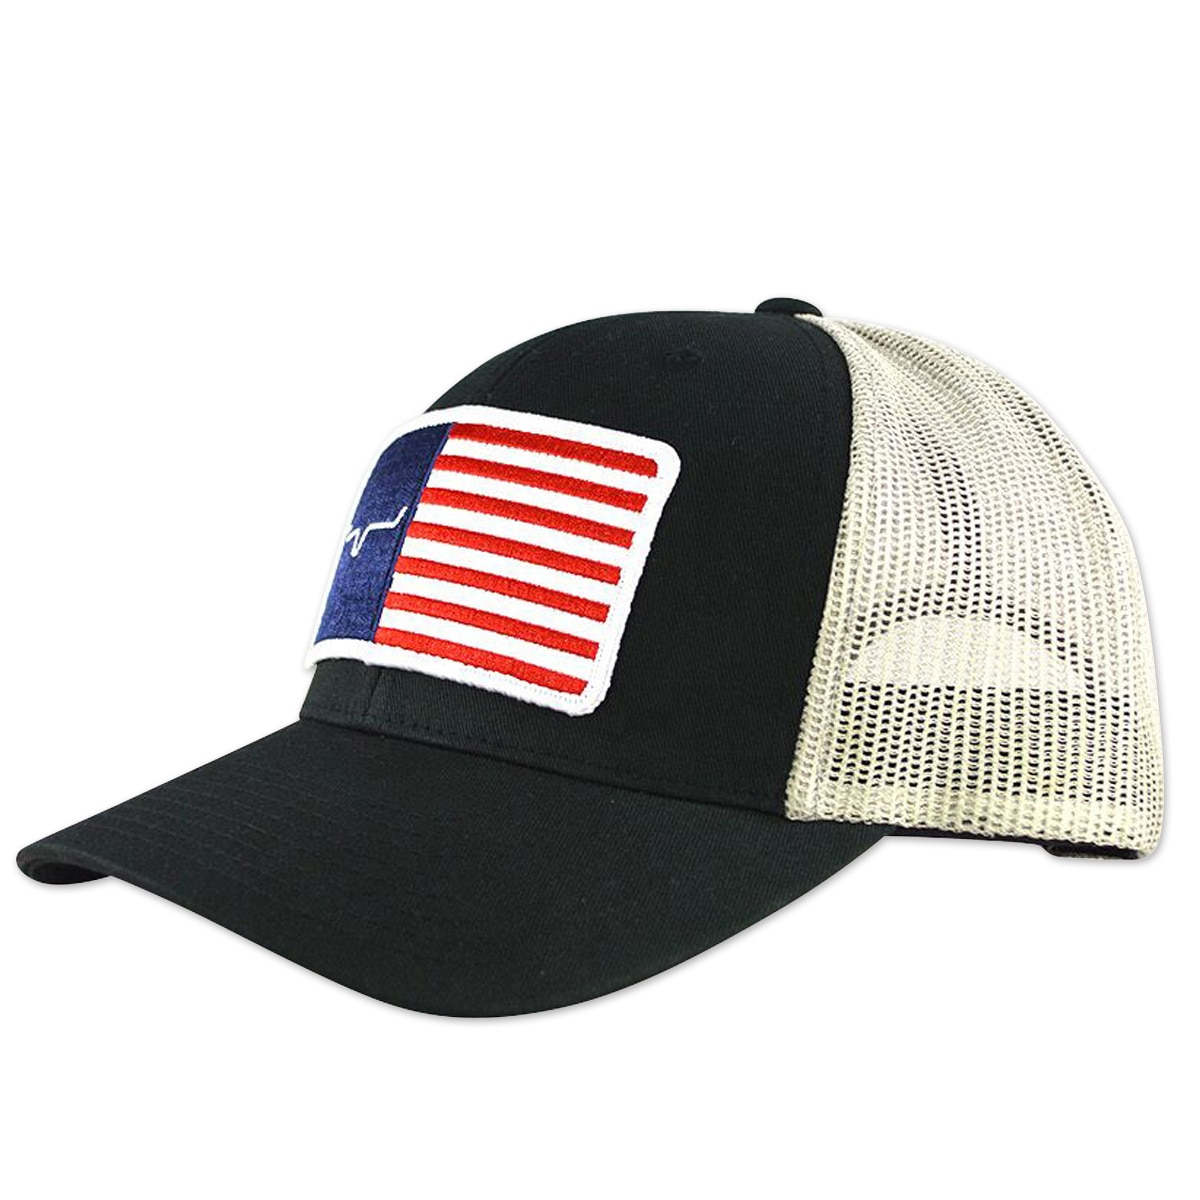 8ae4821e Kimes Ranch American Trucker Hat